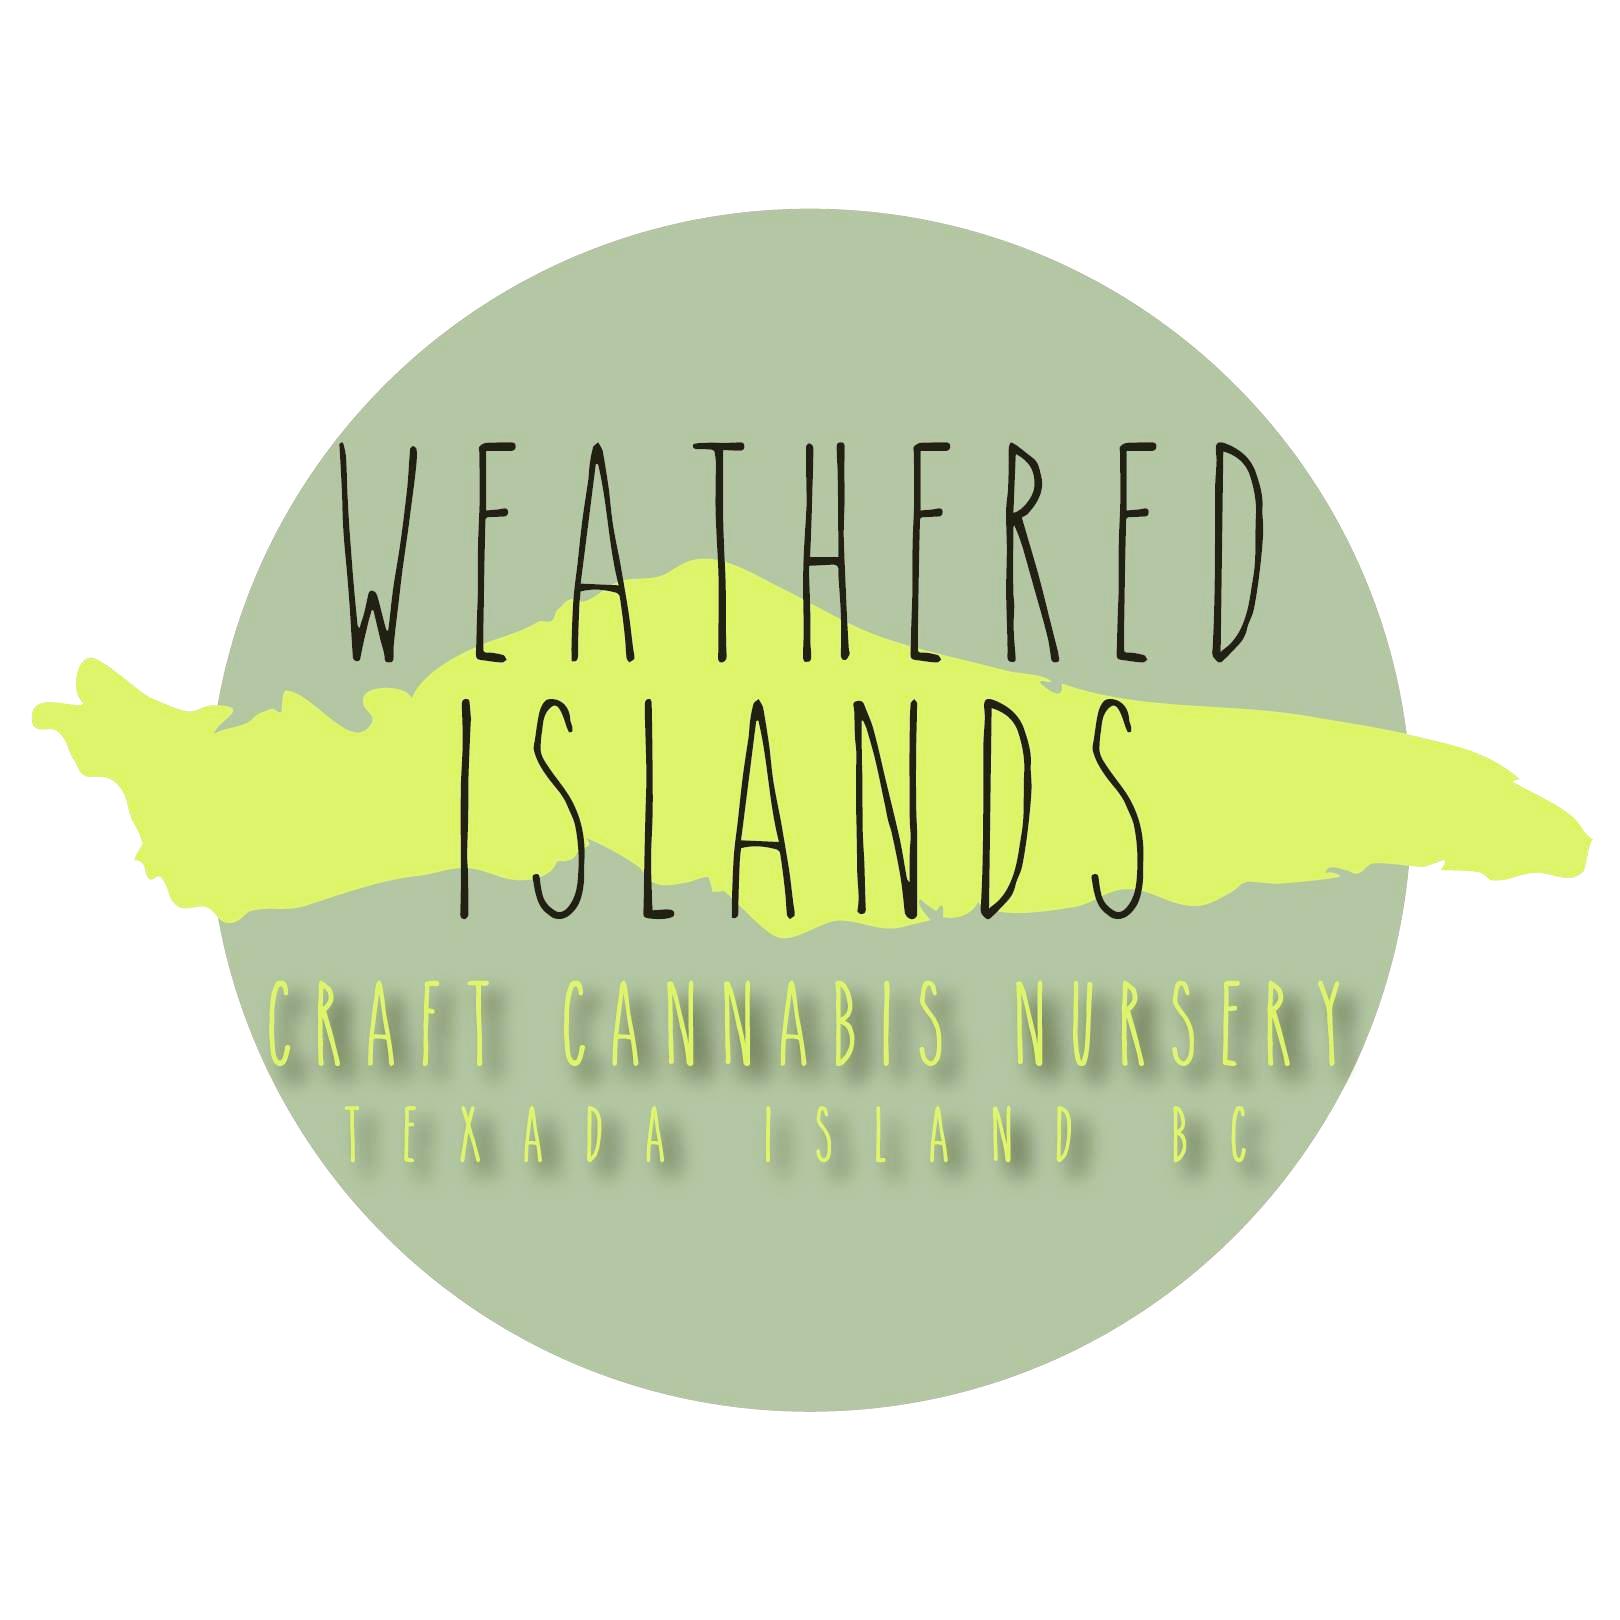 Weathered Islands